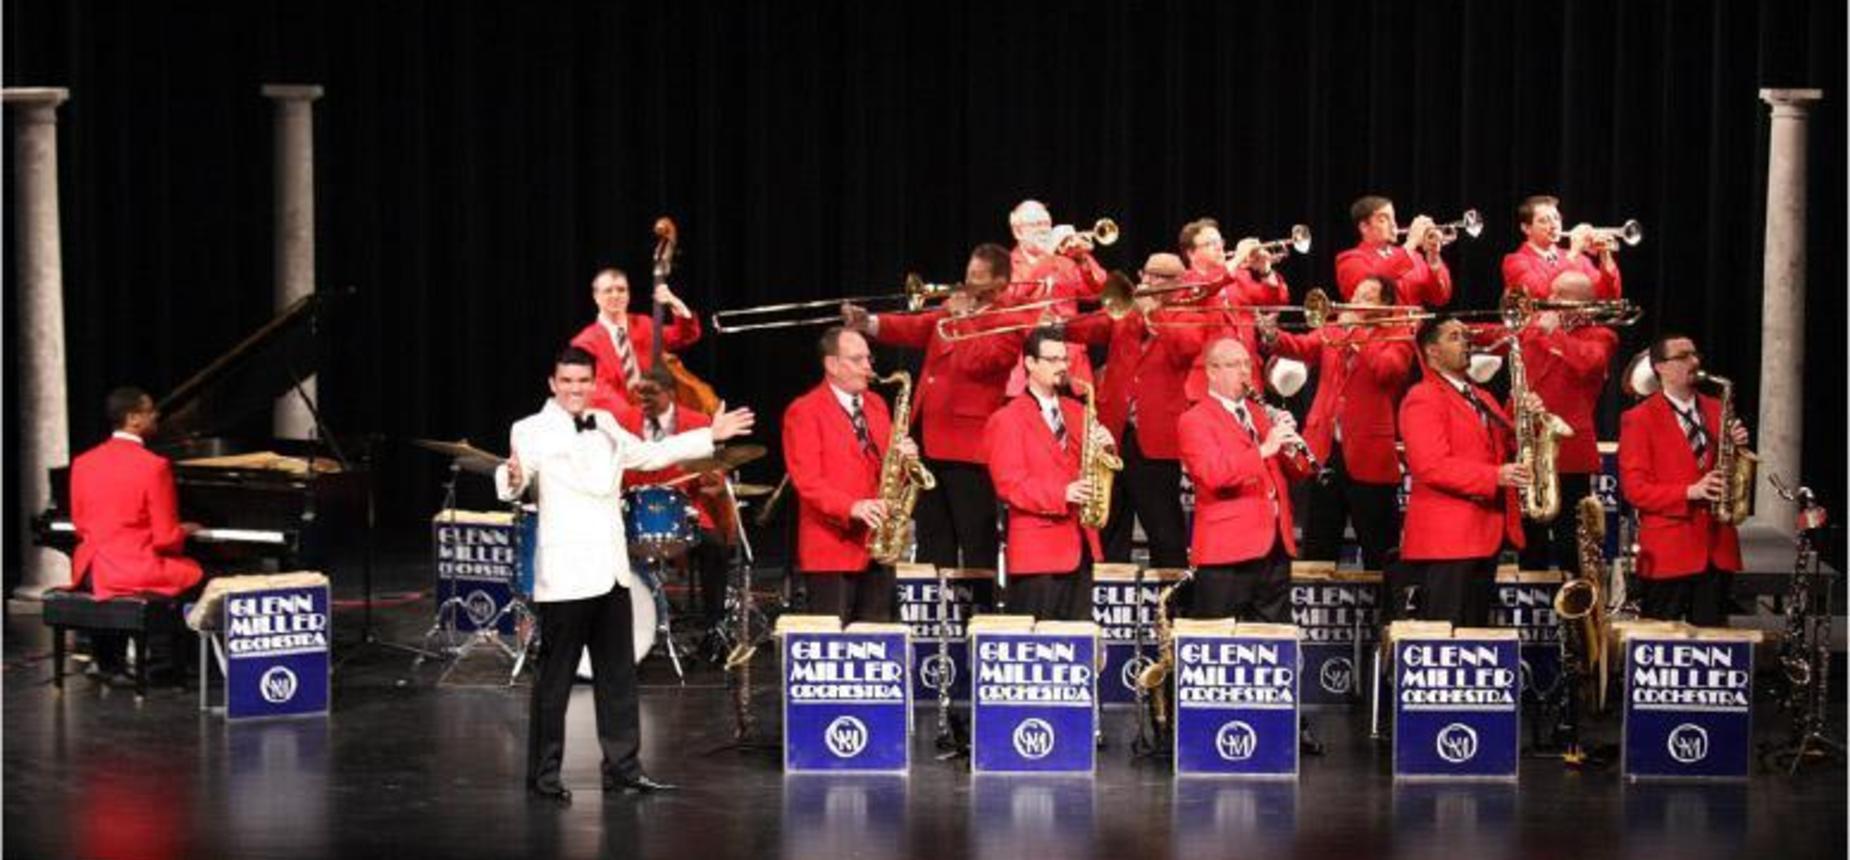 Glenn Mill Concert at Hemlock Fairgrounds May 10 at 7:00pm